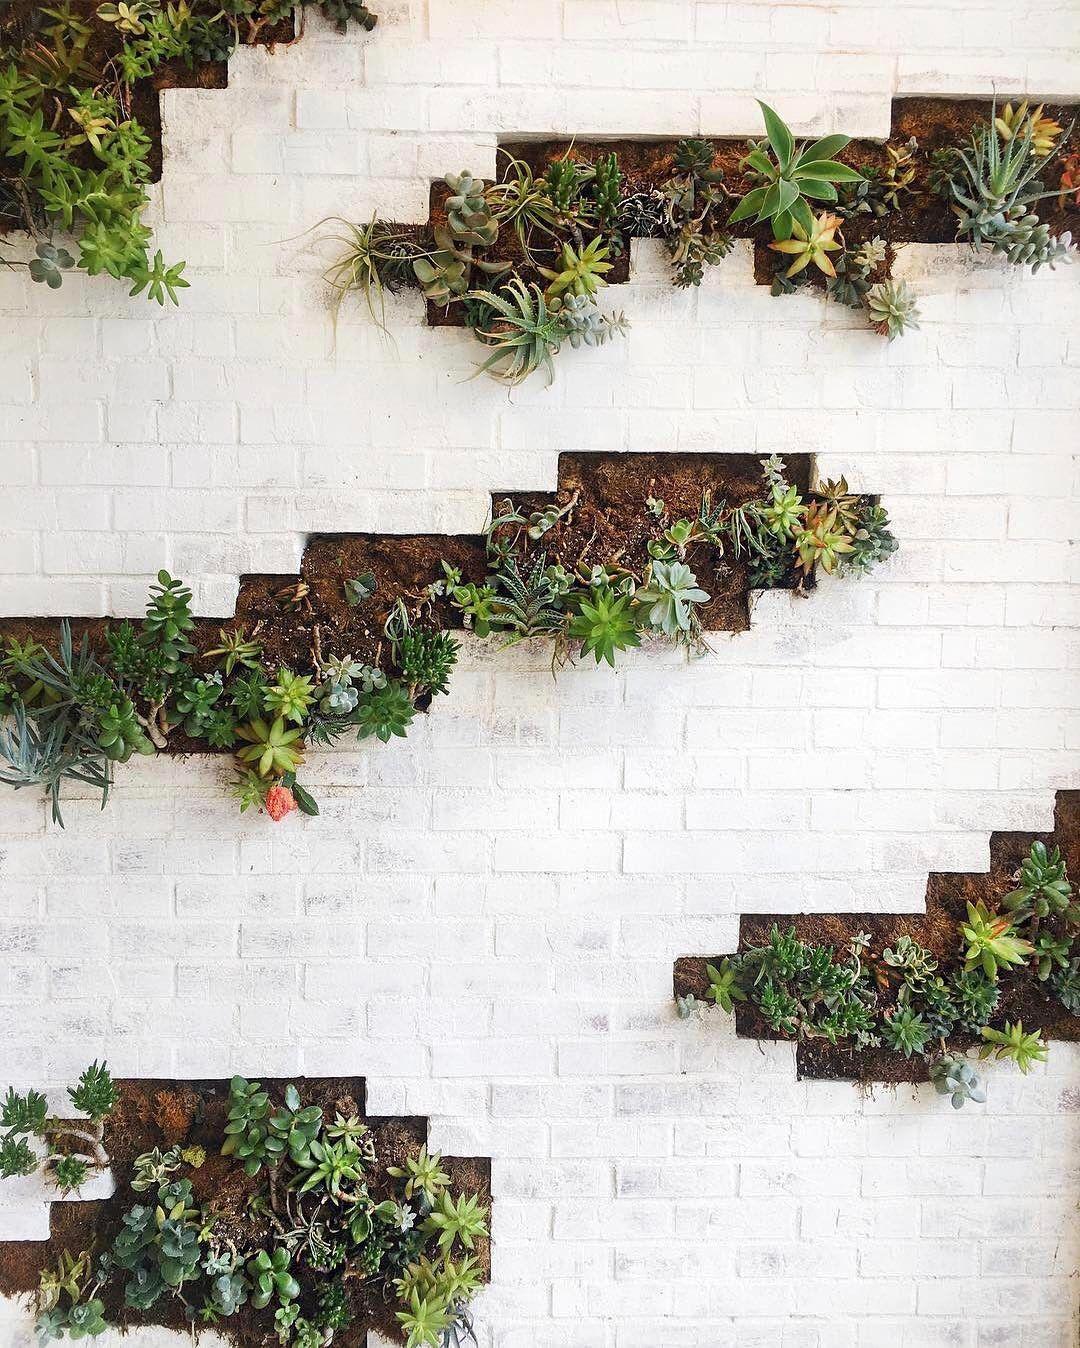 White Brick Succulents Happy Succulentsunday Friends Hauteinthedesert Vertical Garden Wall Garden Wall Succulents